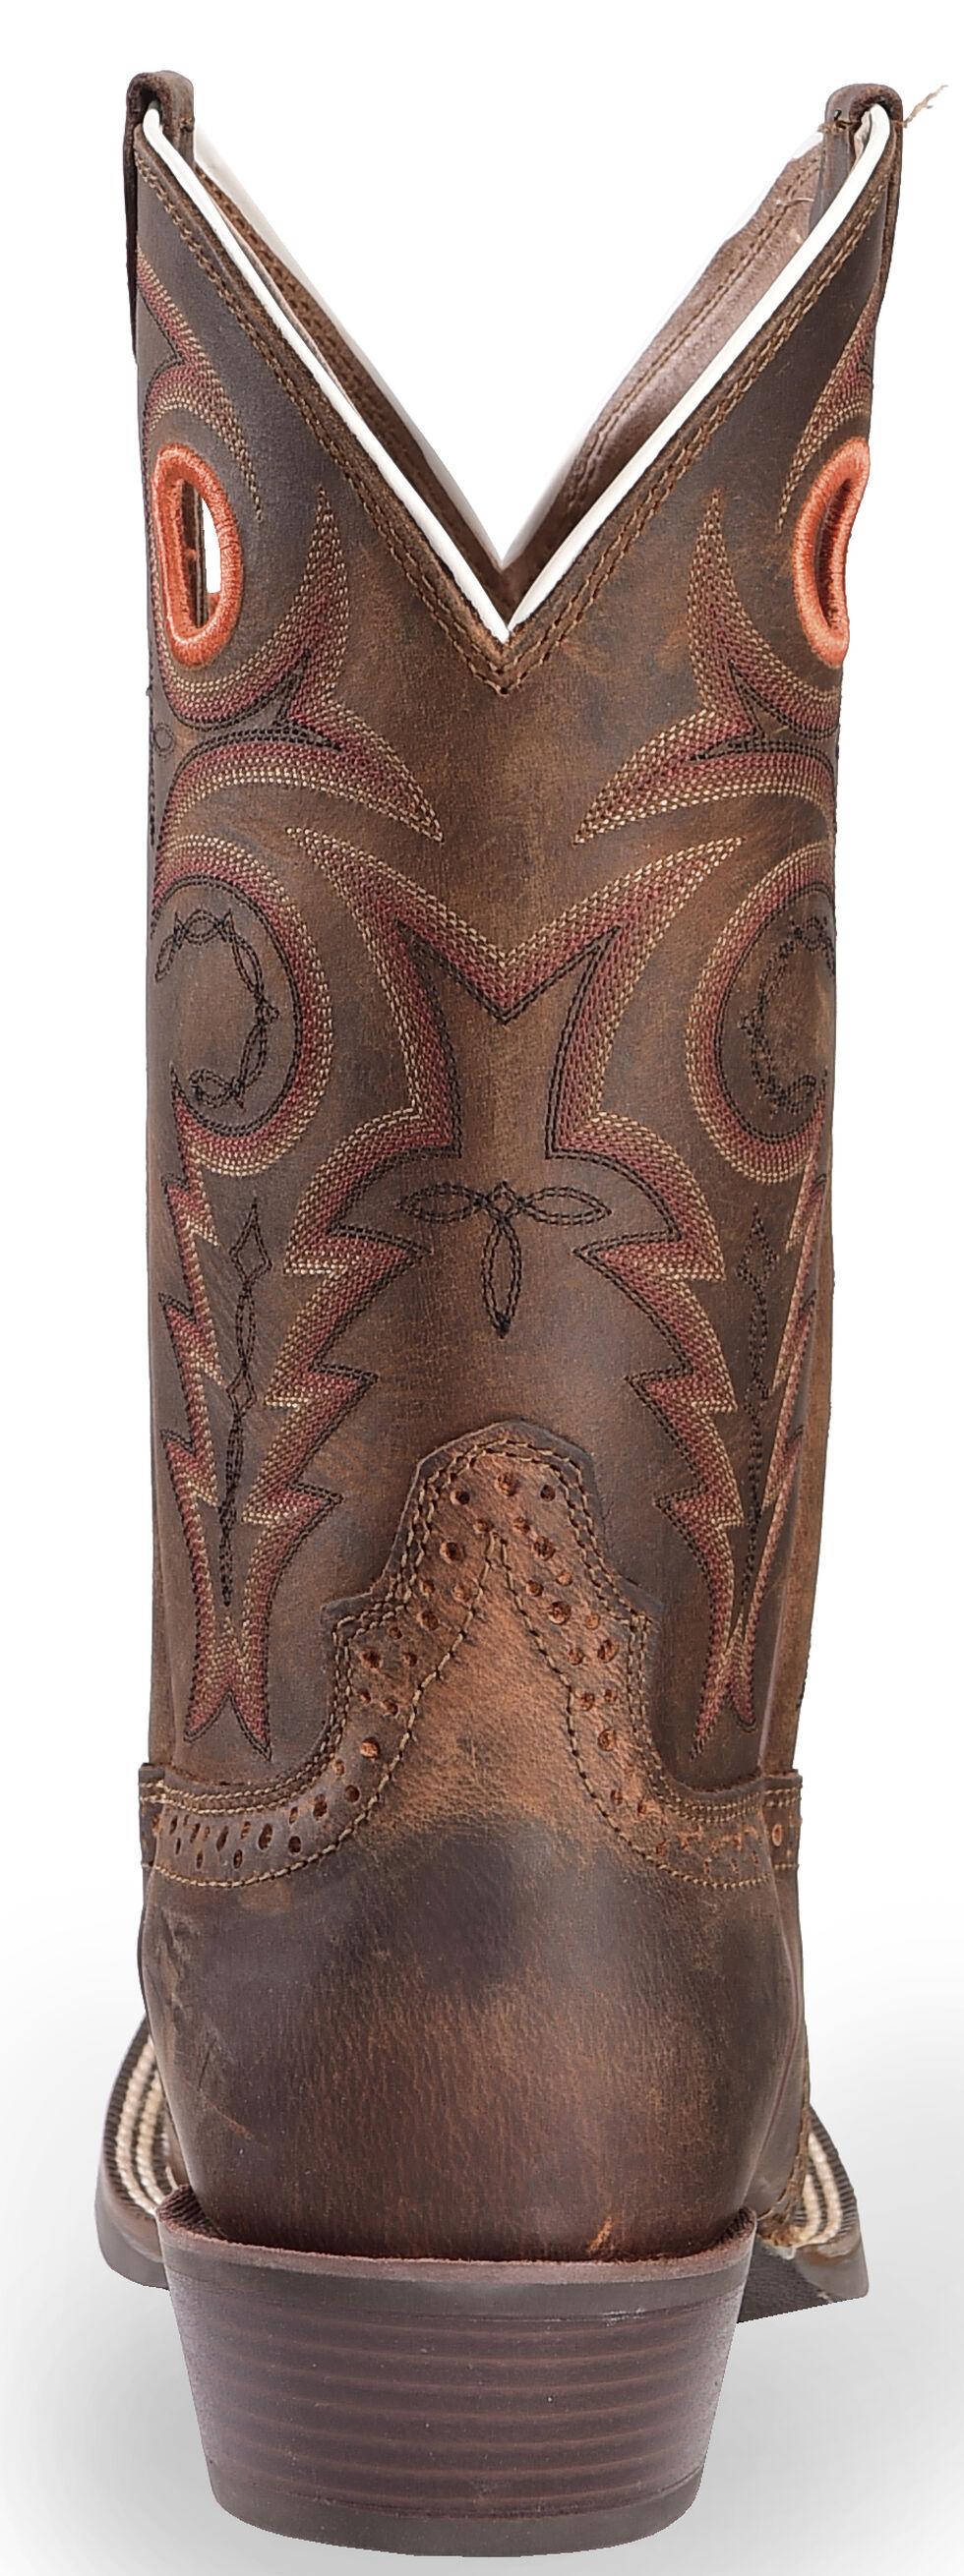 Justin Silver Saddle Vamp Cowboy Boots - Square Toe, Whiskey, hi-res